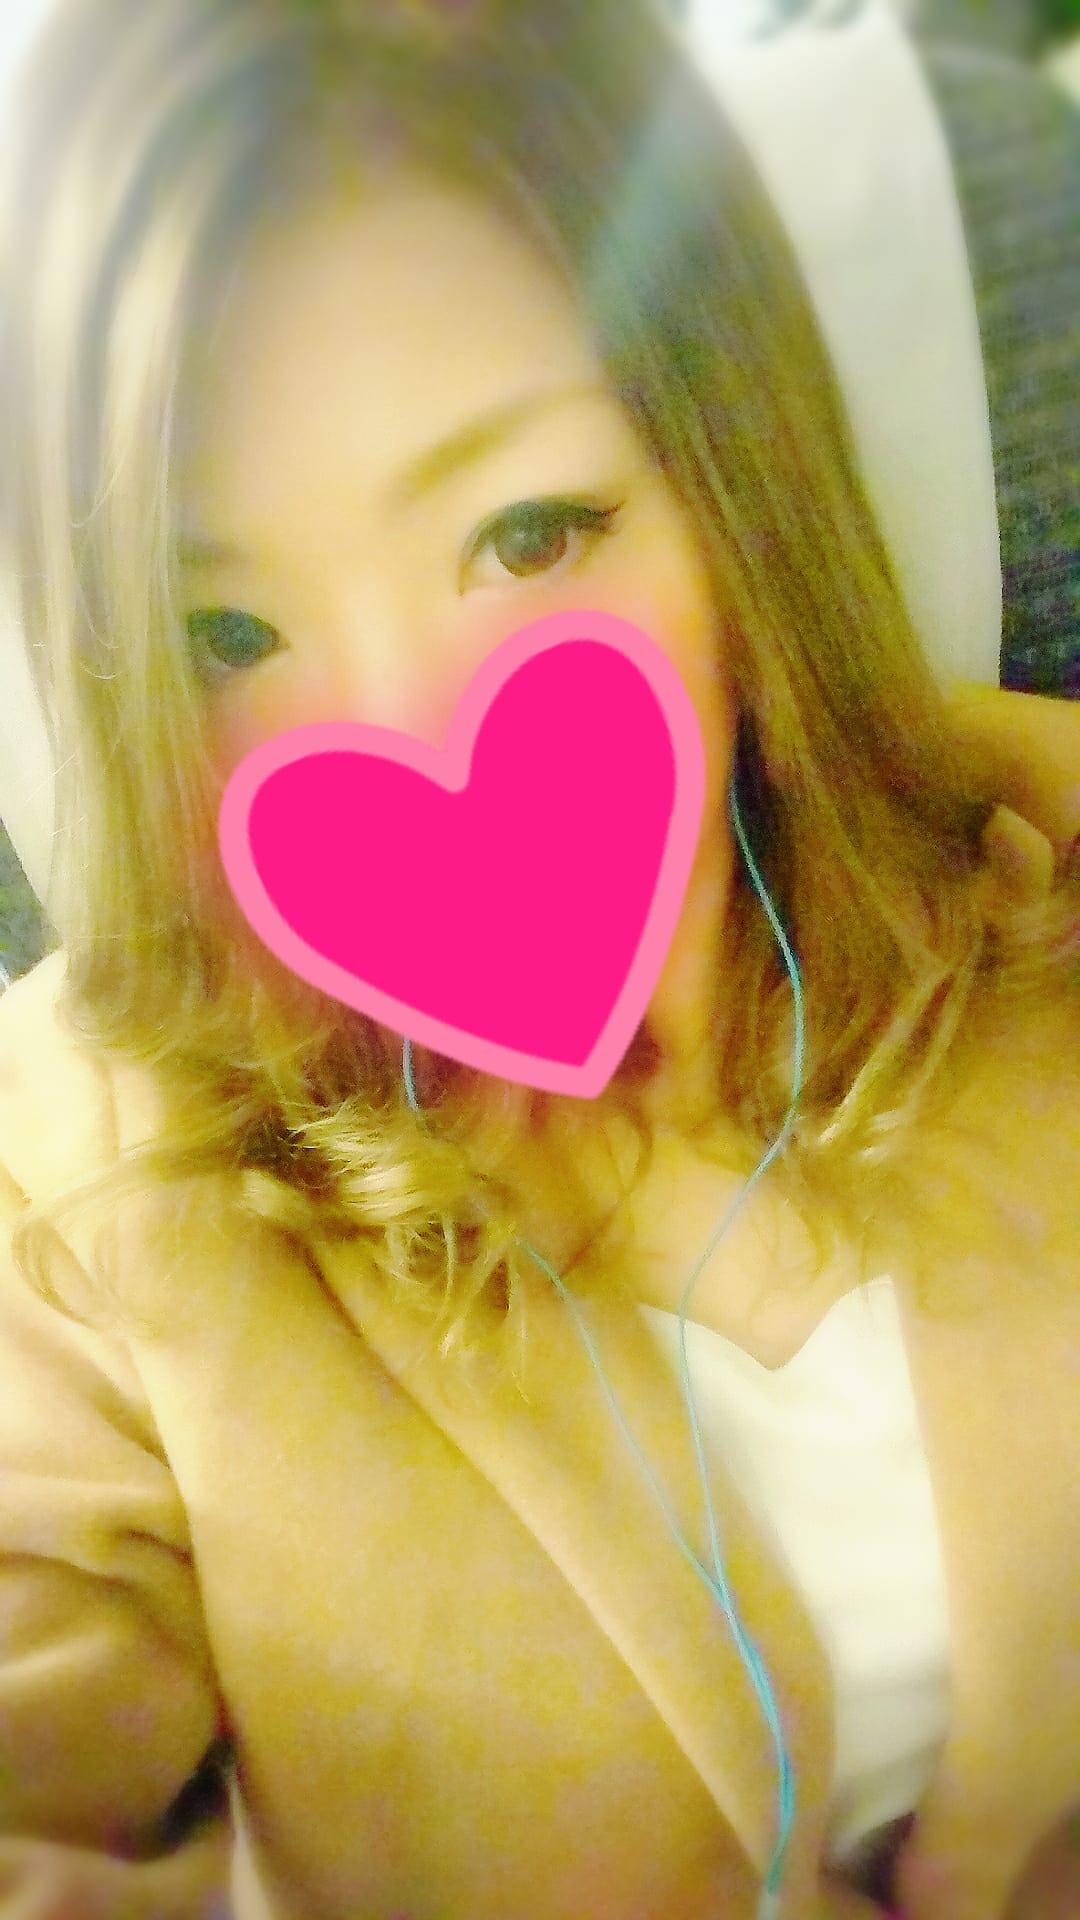 「gm」12/04(12/04) 12:45 | 優樹菜の写メ・風俗動画